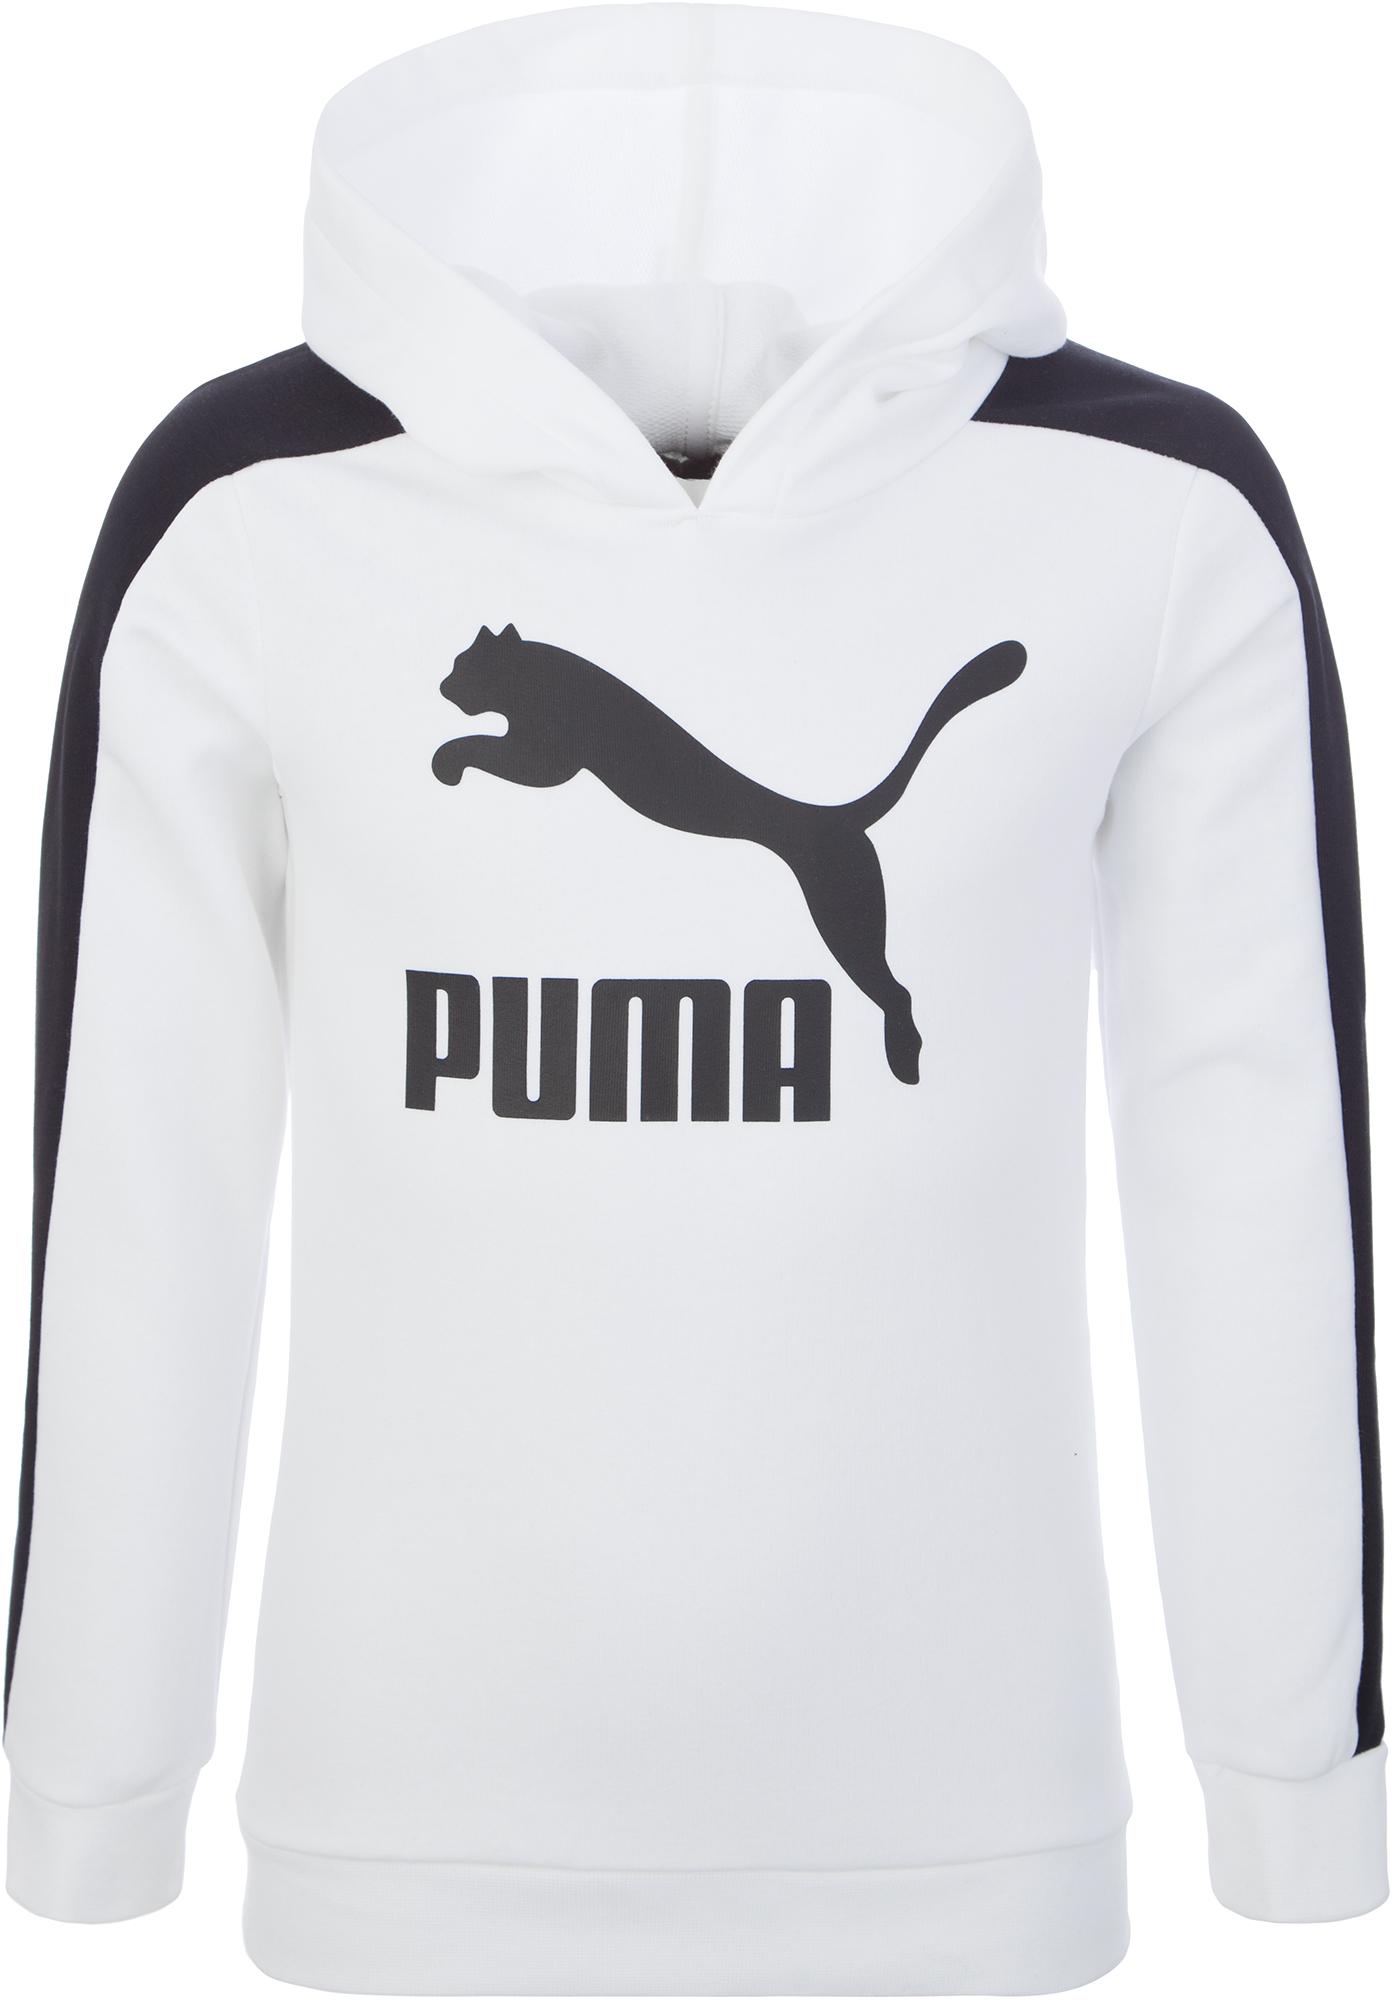 Puma Джемпер для девочек Puma Classics T7, размер 164